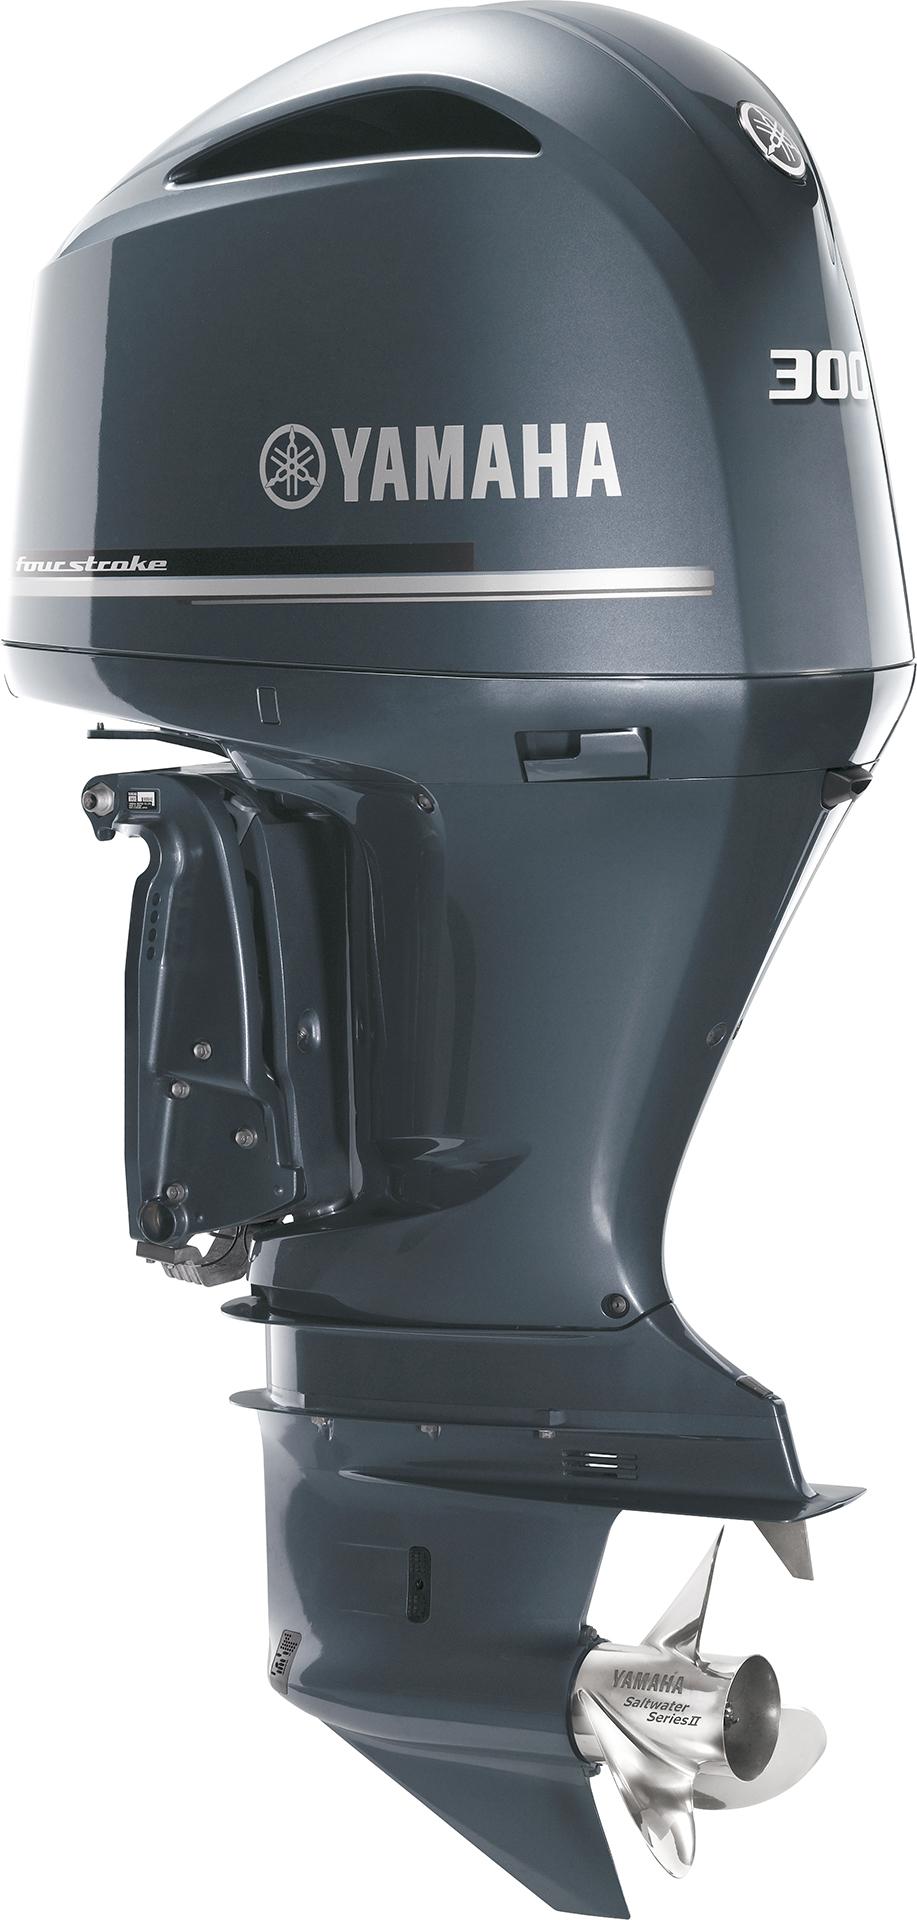 Yamaha F300XNCA Offshore 4.2L